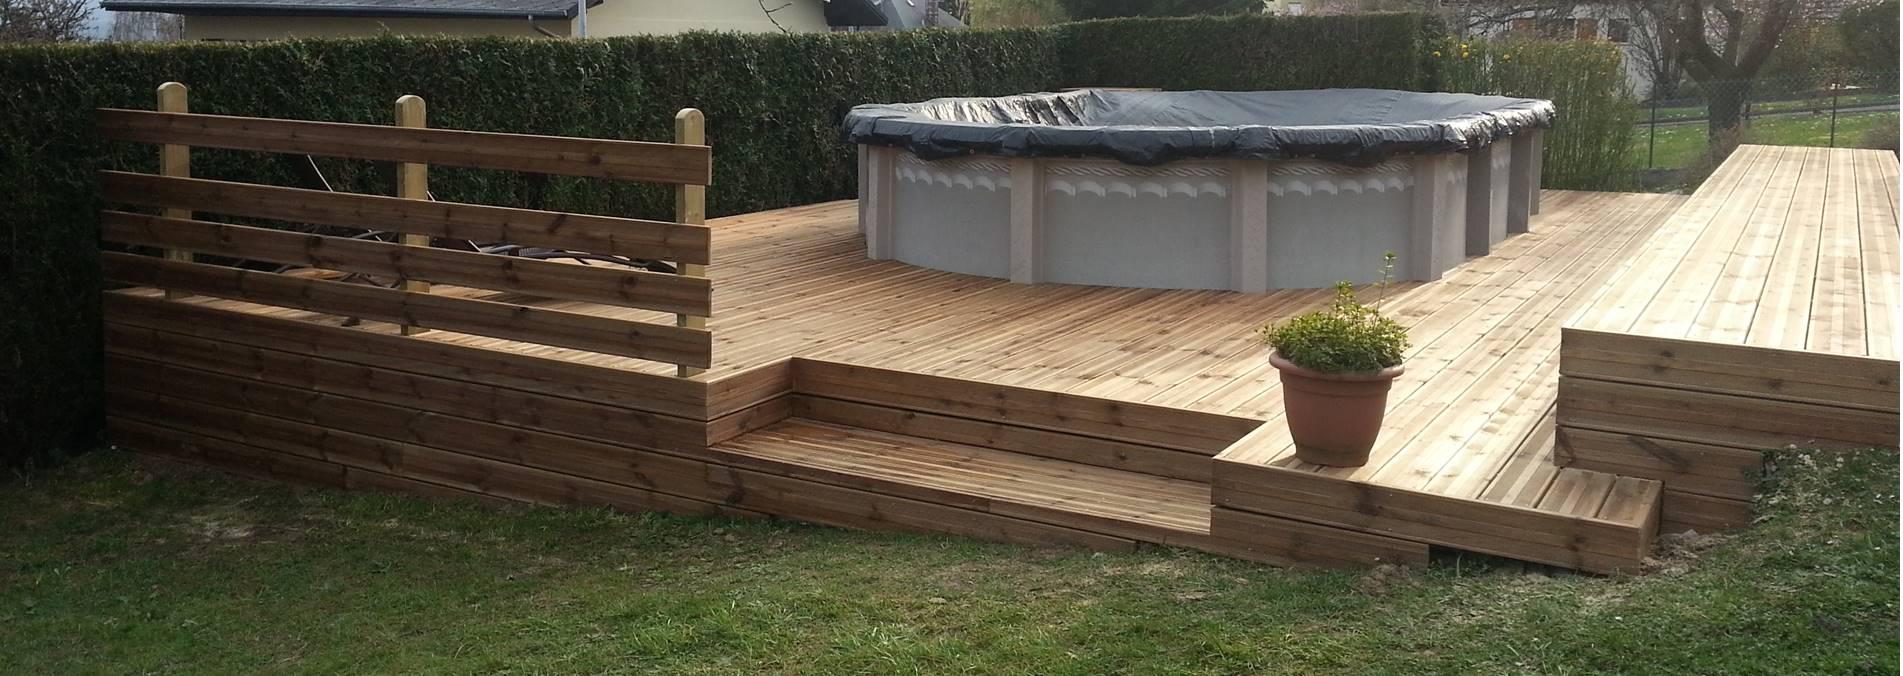 terrasse pin classe 4 cool lame en pin trait classe helsinki lisse with terrasse pin classe 4. Black Bedroom Furniture Sets. Home Design Ideas